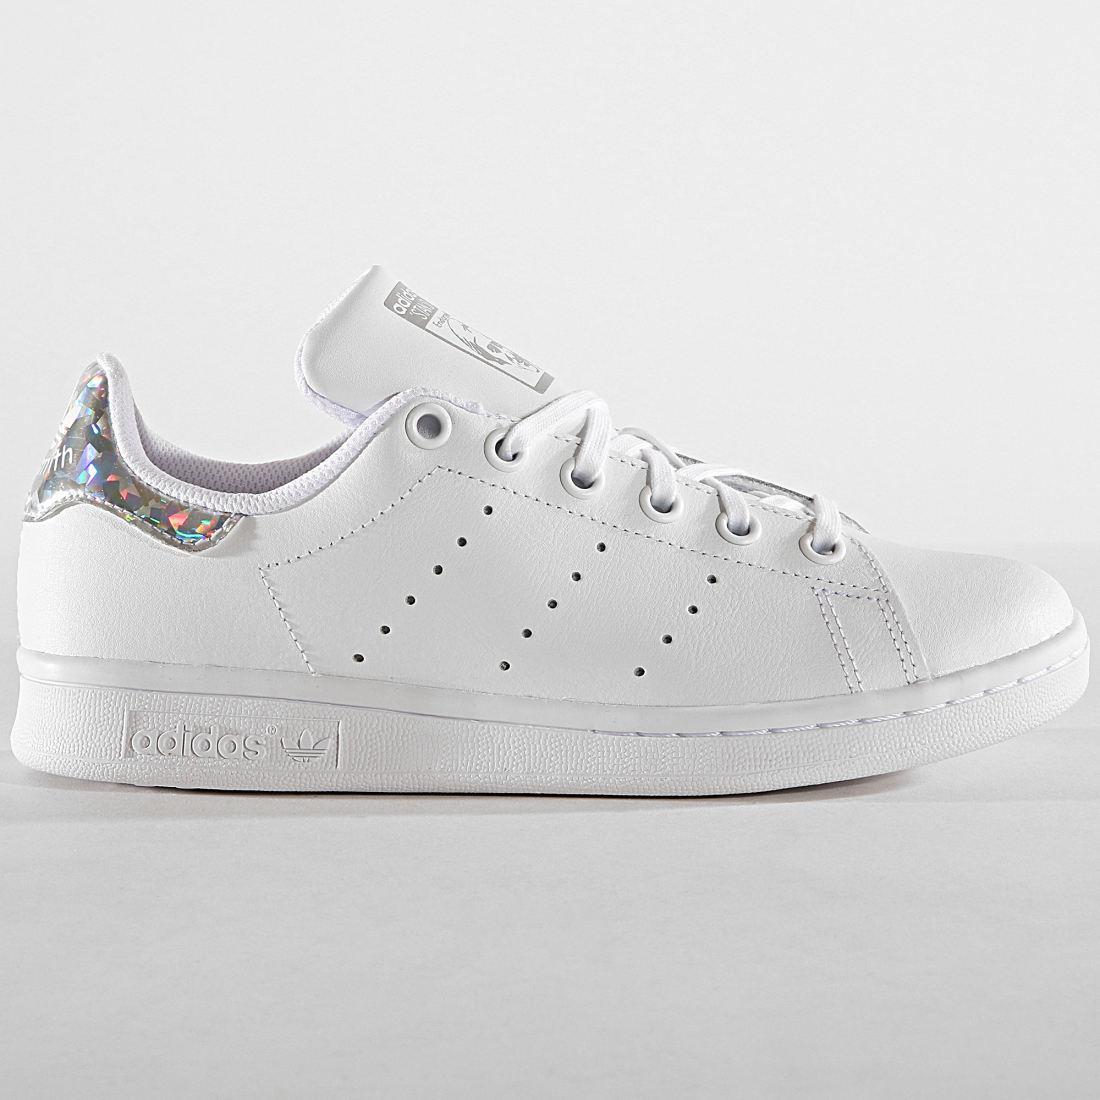 adidas - Baskets Femme Stan Smith EE8483 Footwear White ...